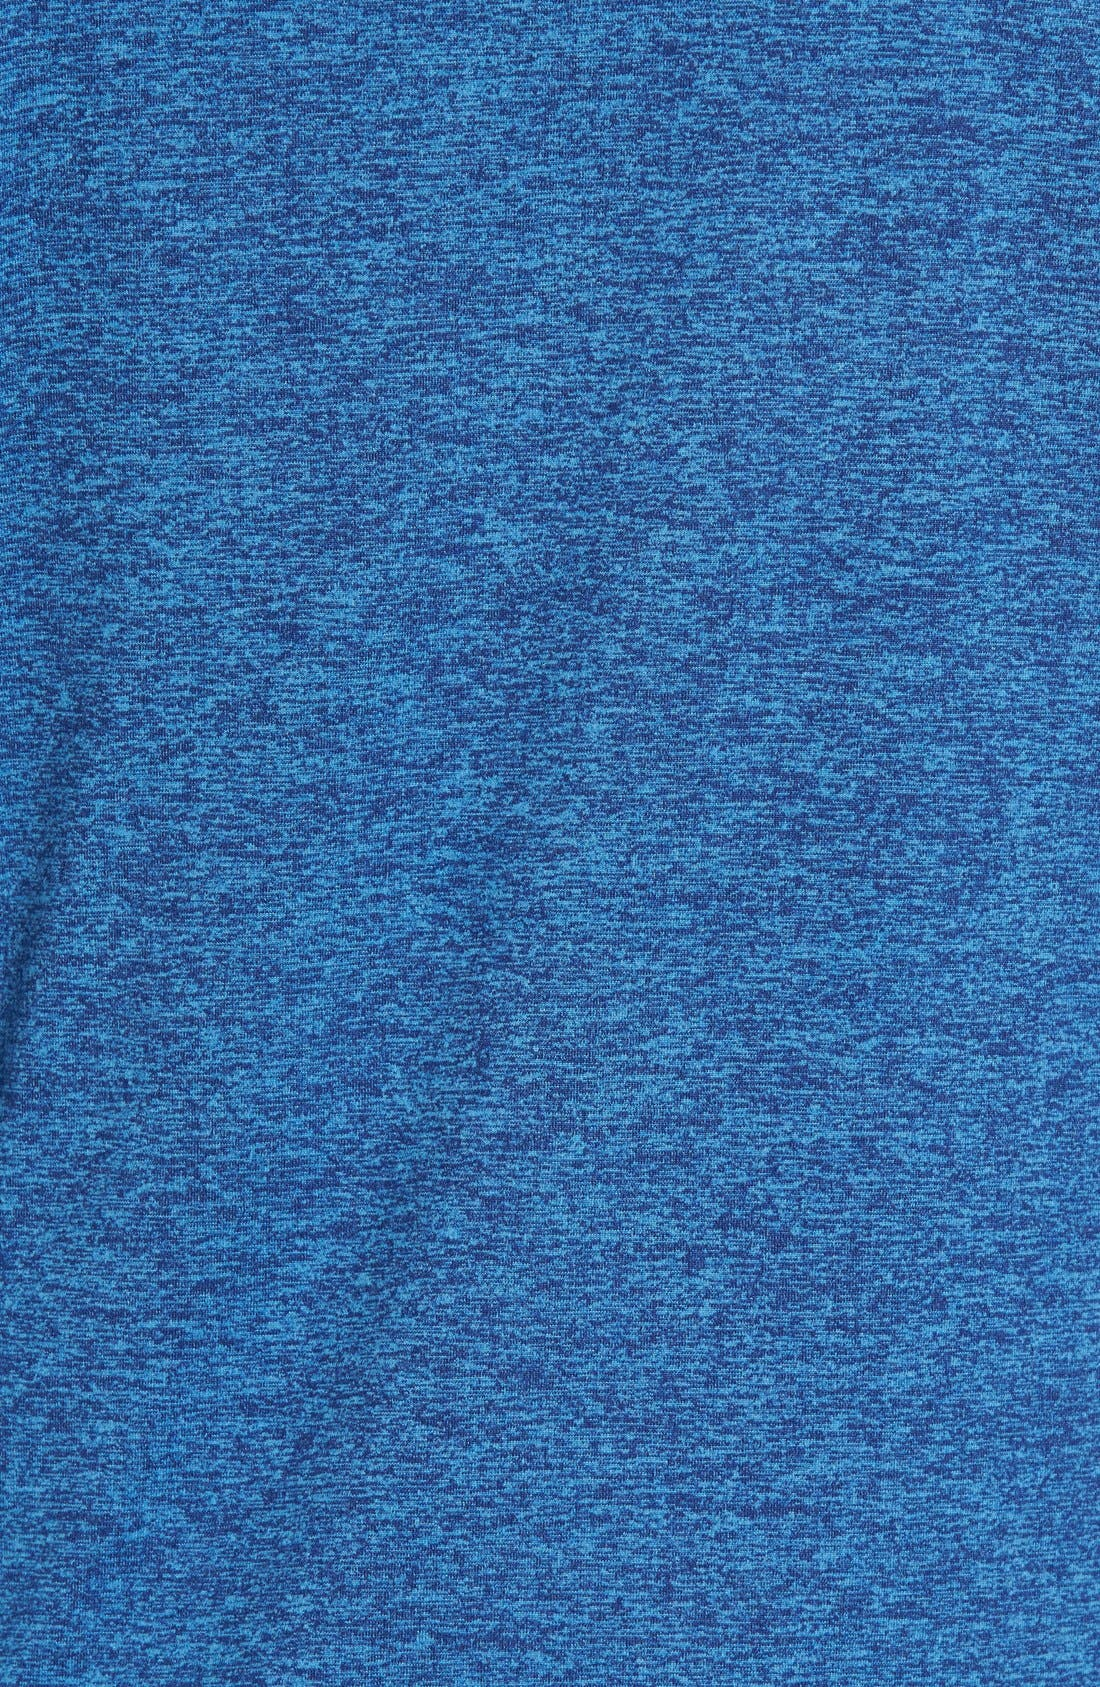 SODO, 'Elevate' Moisture Wicking Stretch Quarter Zip Pullover, Alternate thumbnail 6, color, OCEAN BLUE/ NAVY